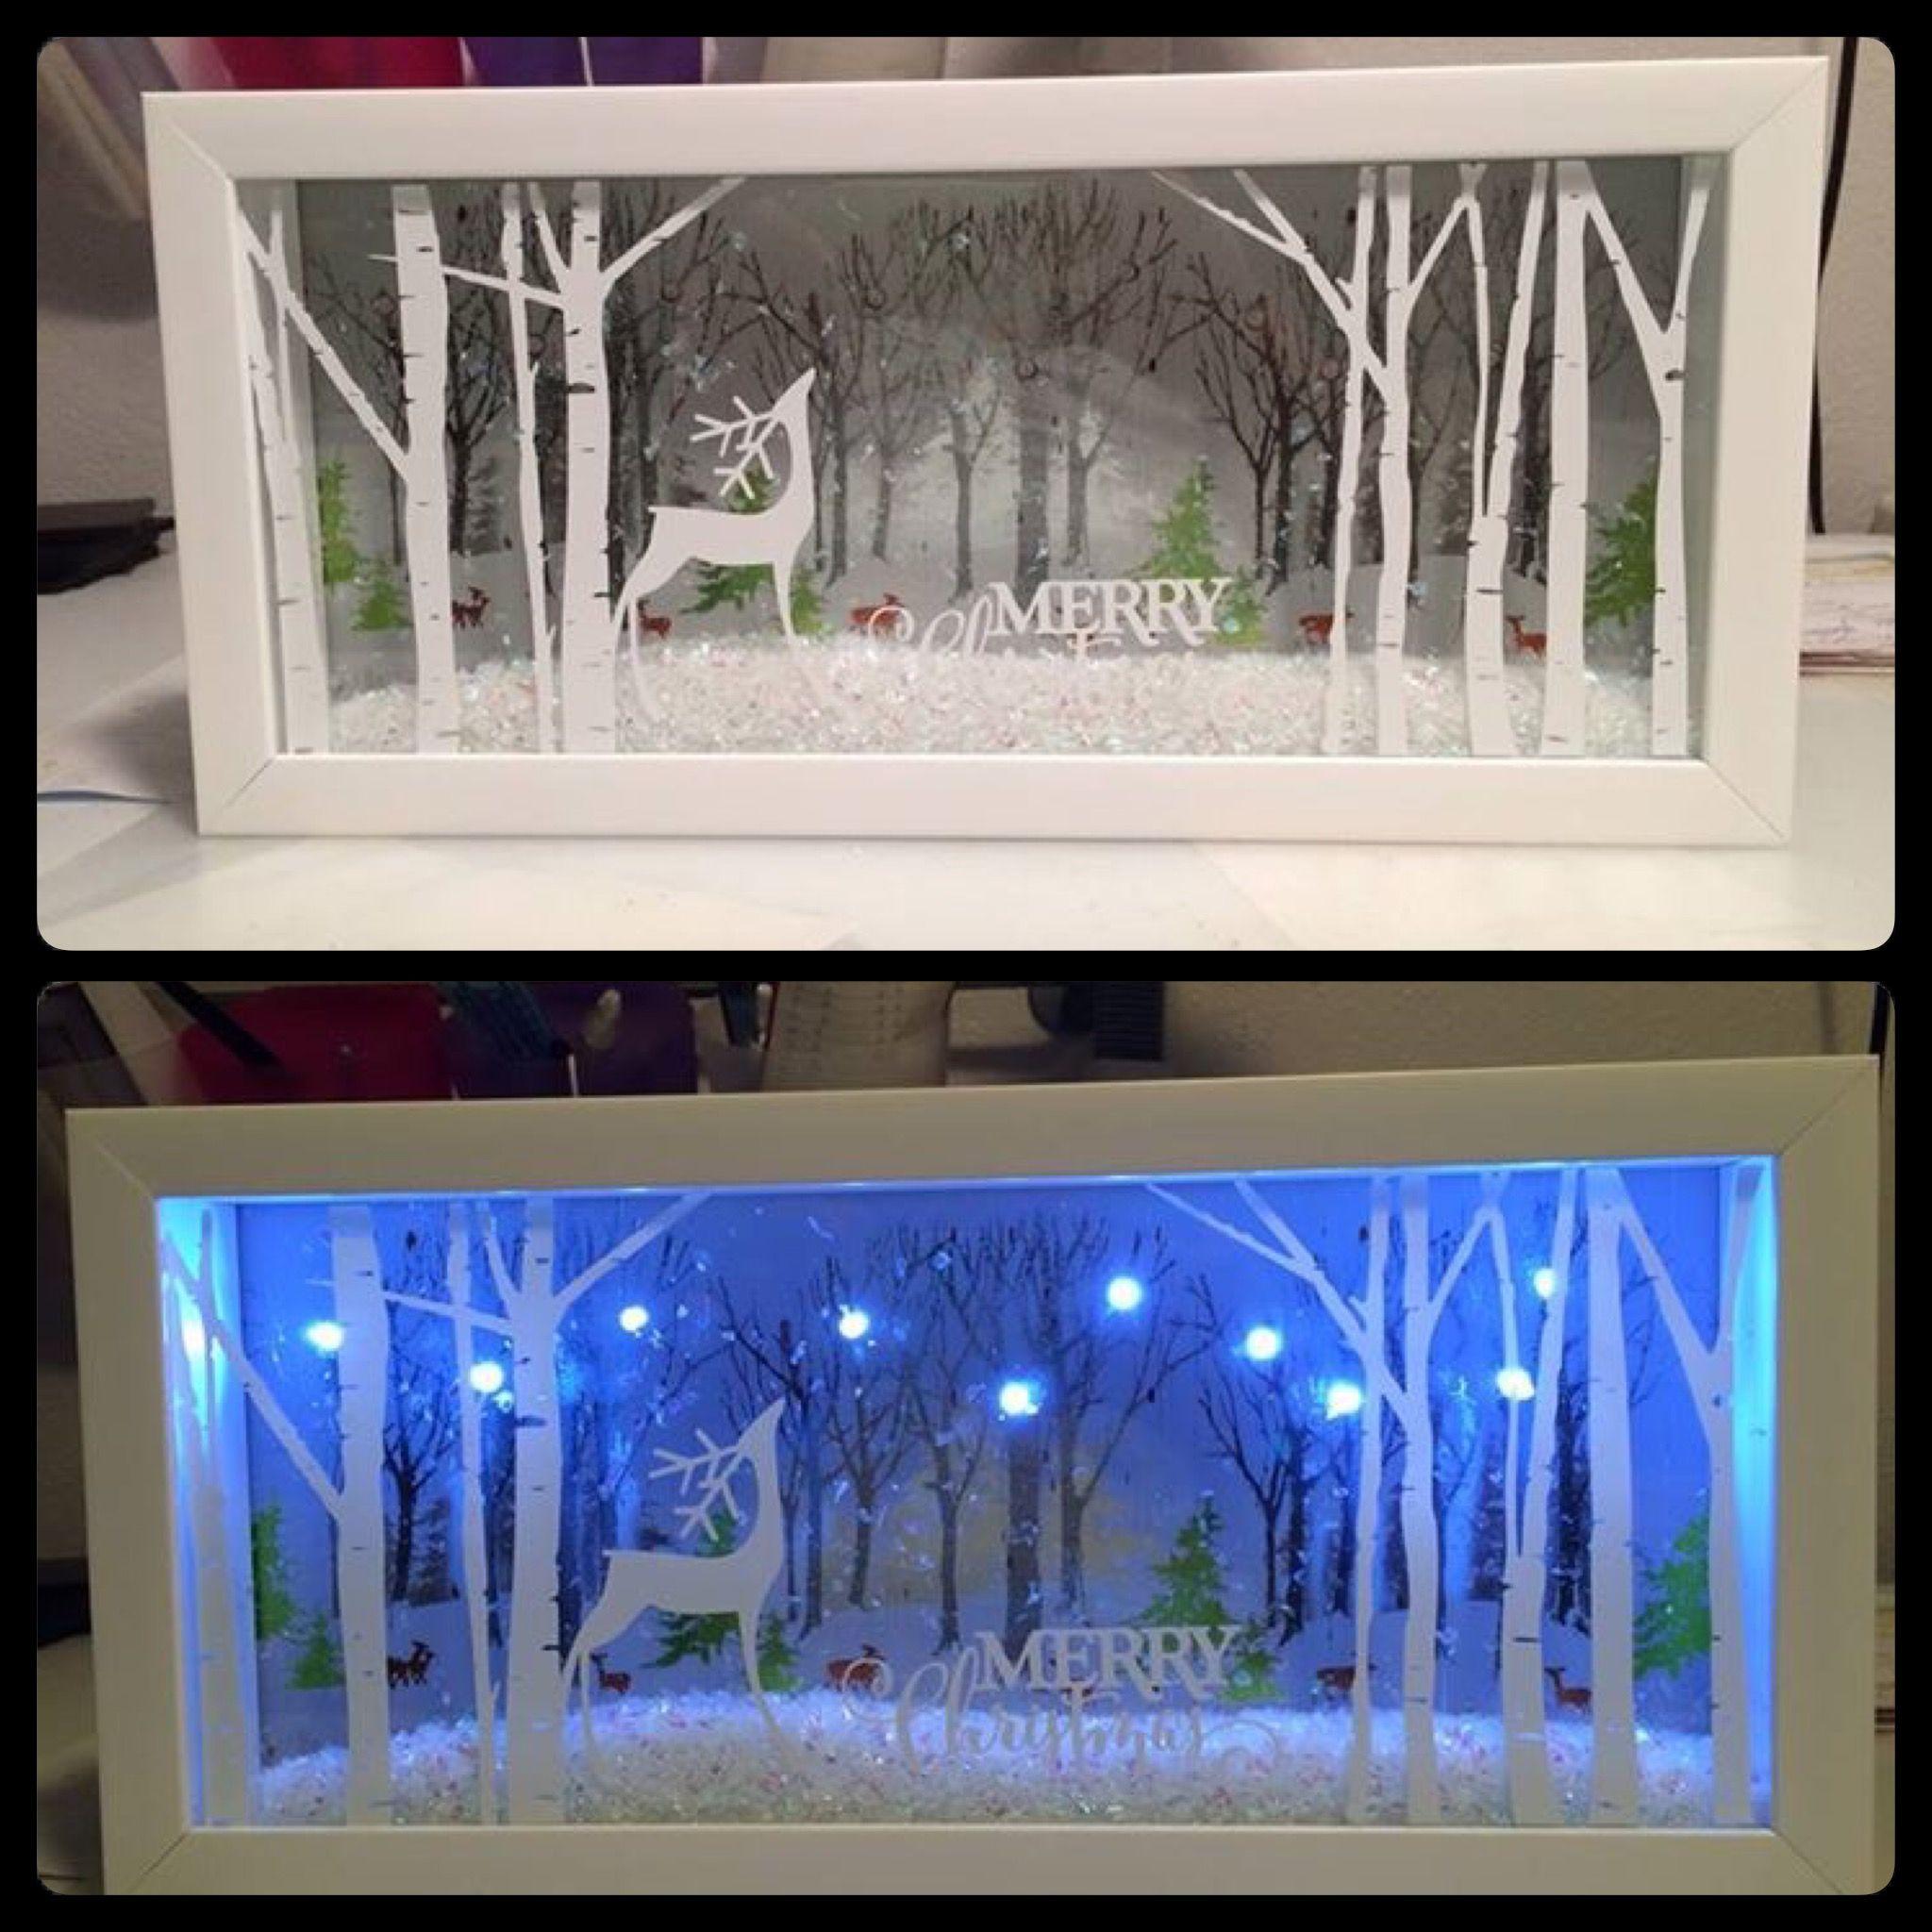 20 Shadow Box Ideas, Cute and Creative Displaying ...